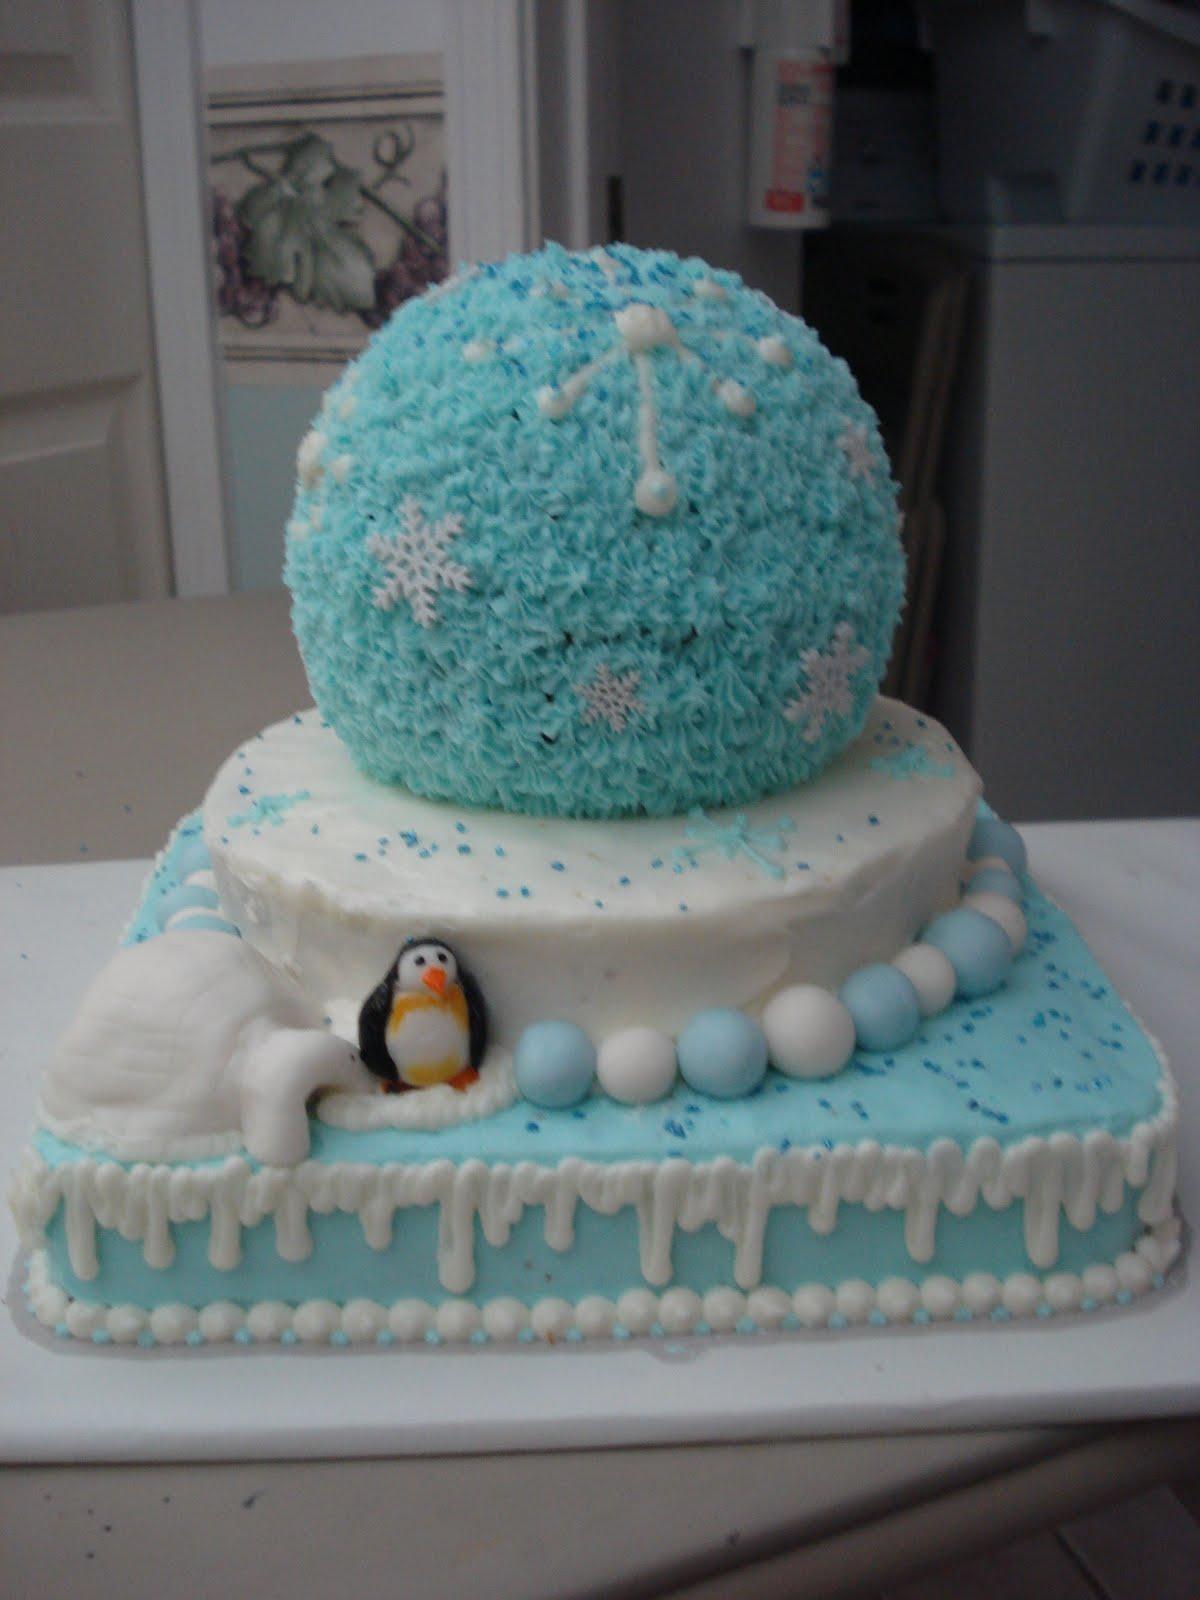 Stettie Cakes Snowglobe Cake